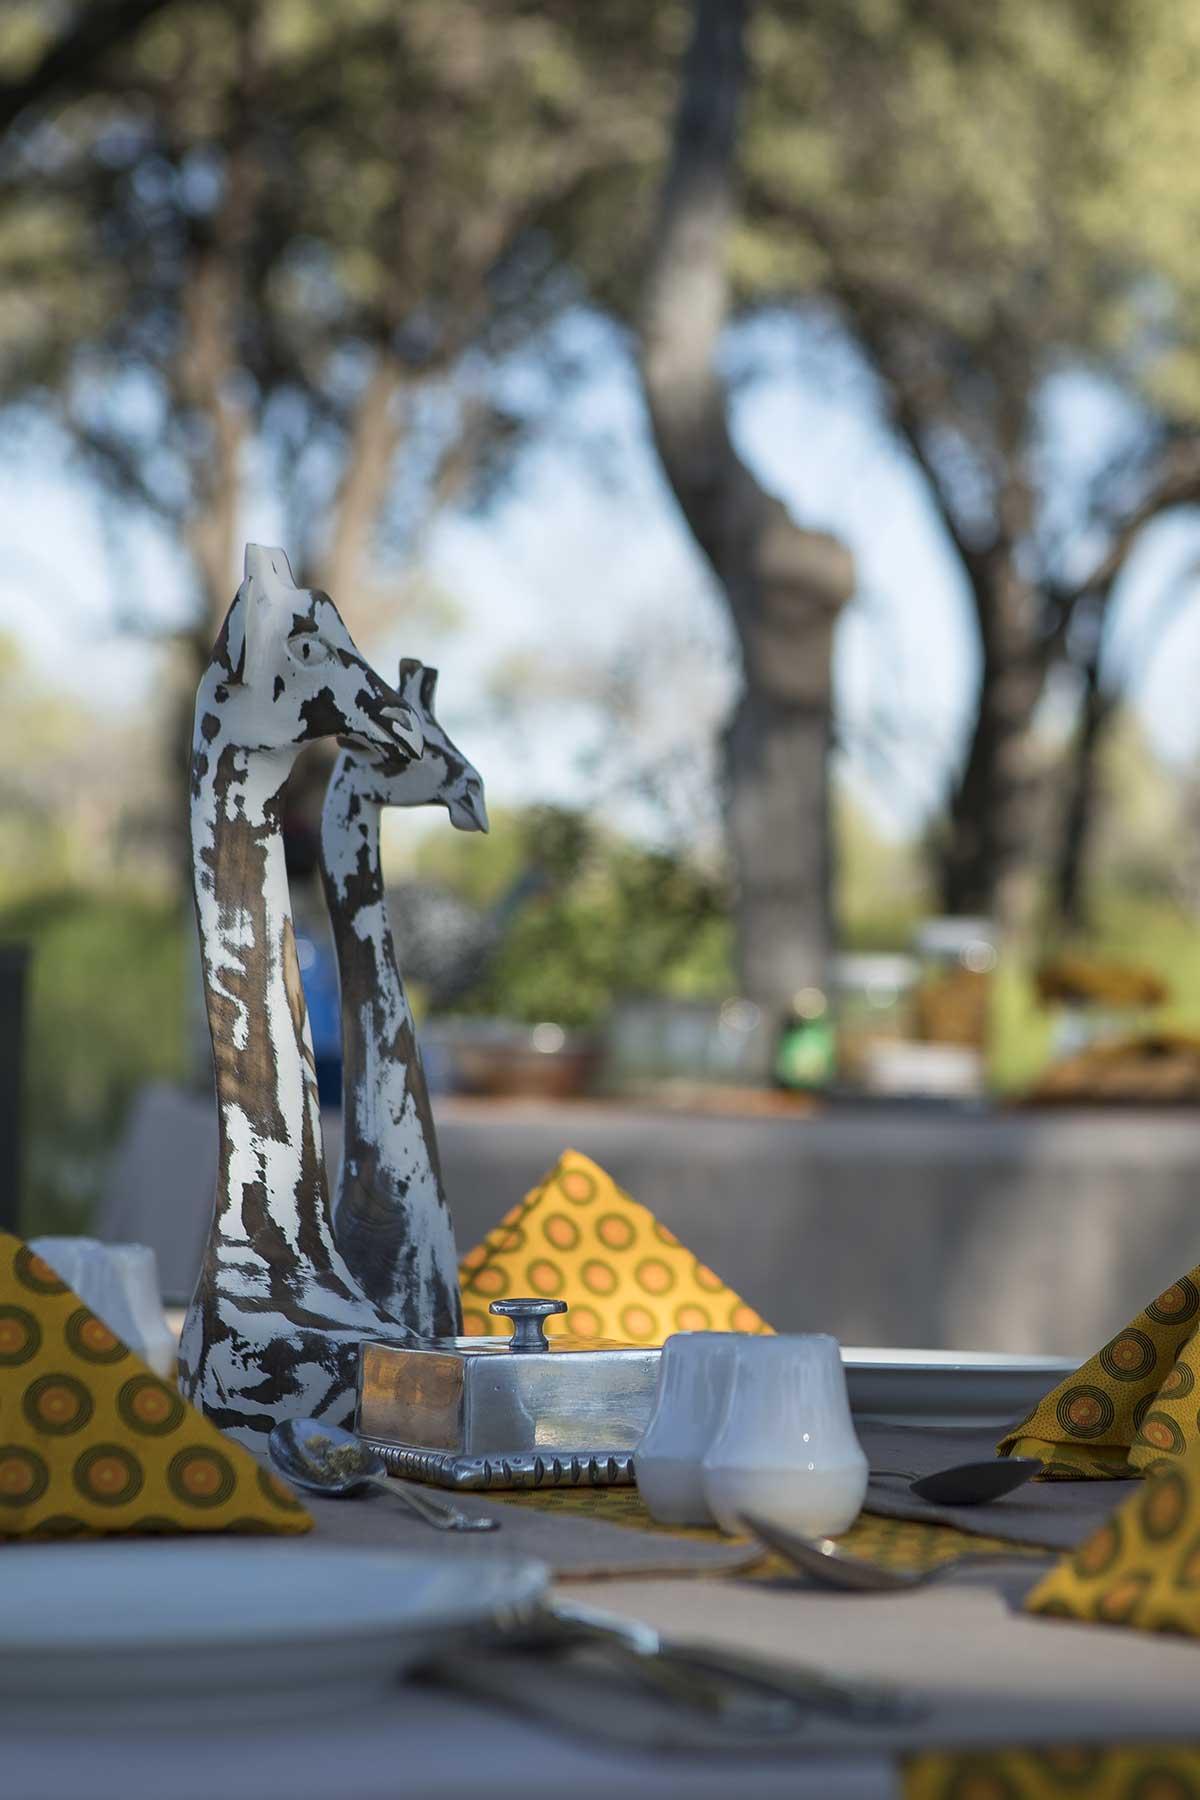 Mobile safari with Chase Africa Safaris